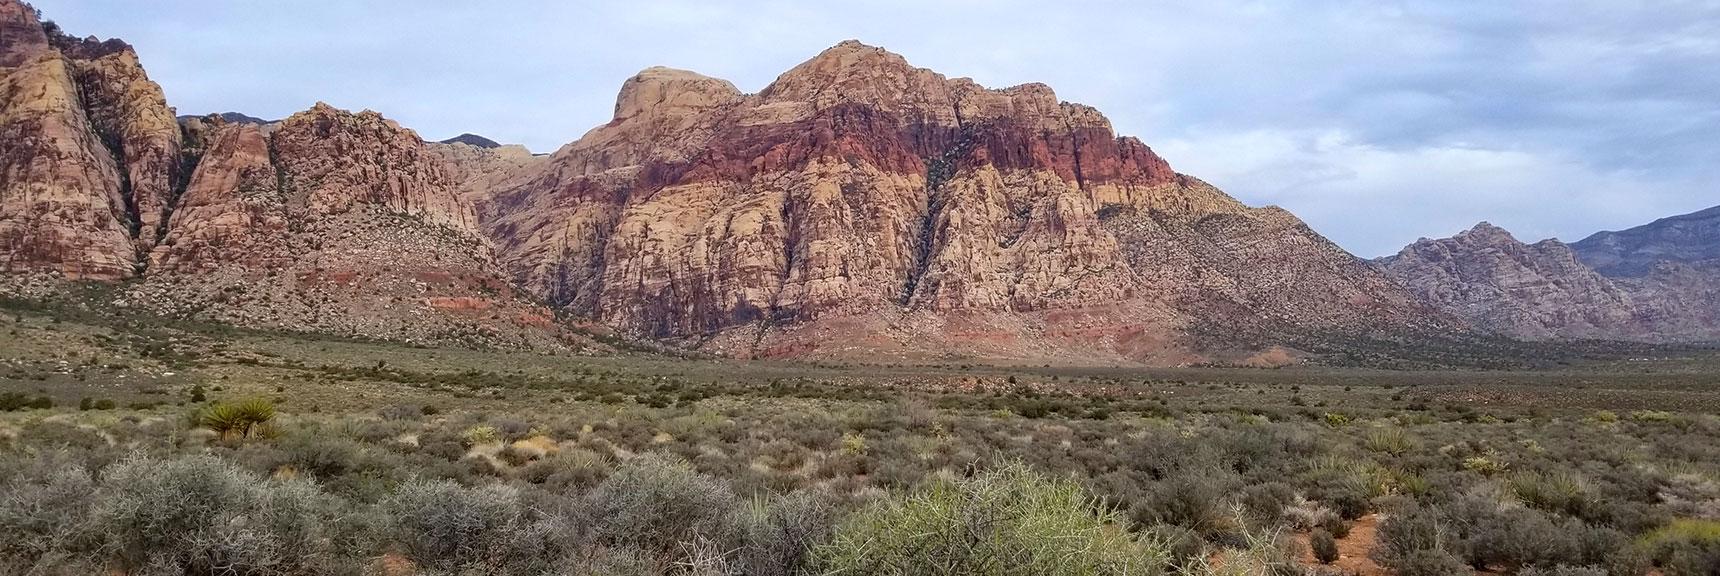 Juniper Peak, Pine Creek Canyon and Bridge Mountain, Rainbow Mountain Wilderness, Nevada